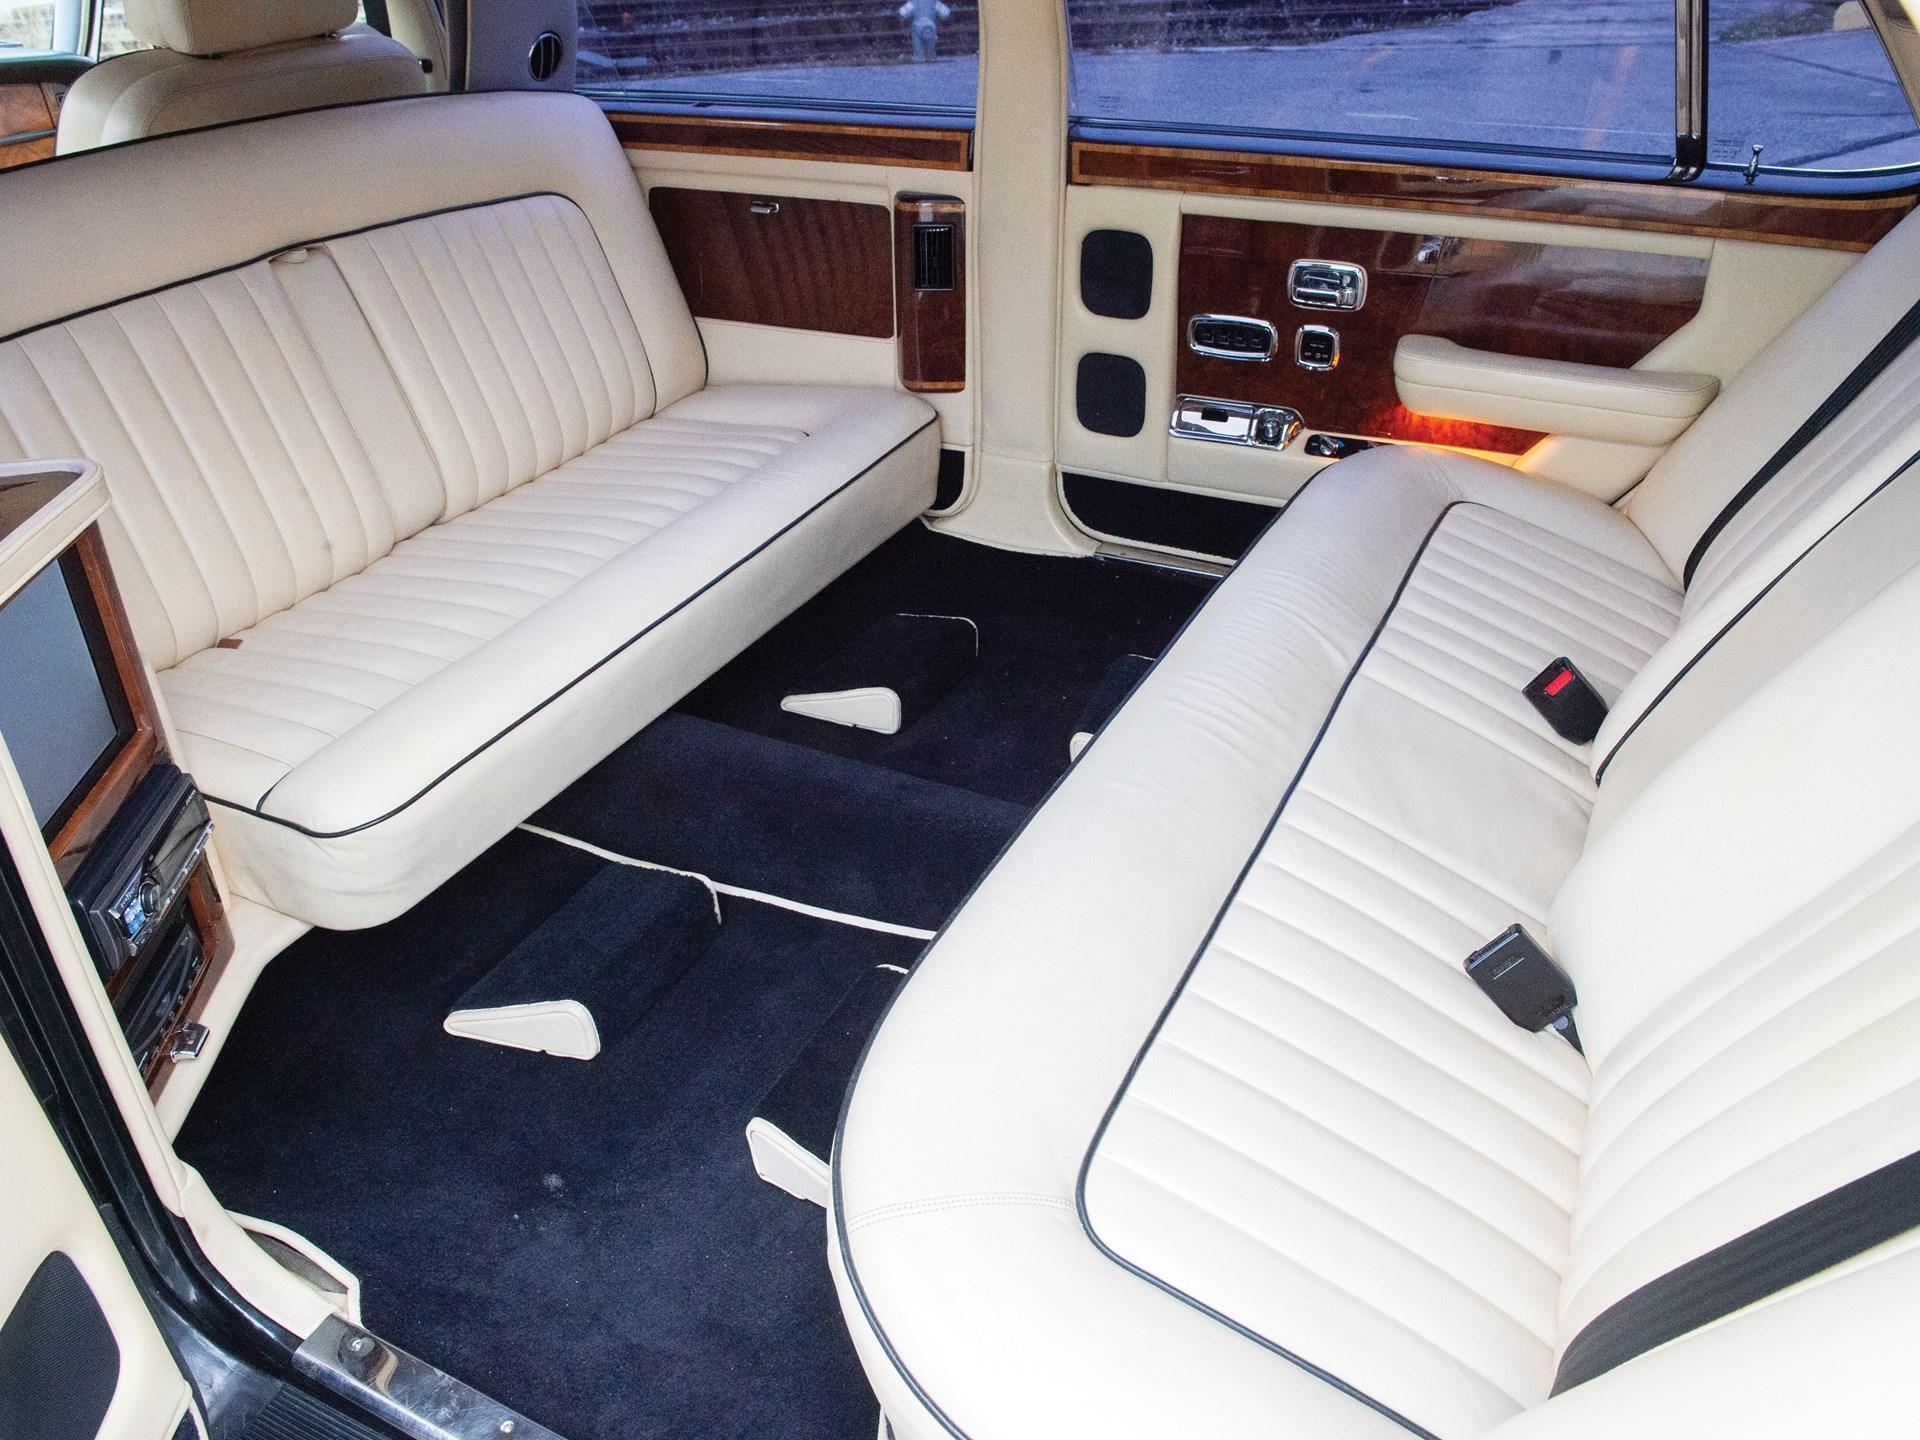 1987 Rolls-Royce Silver Spur Limousine